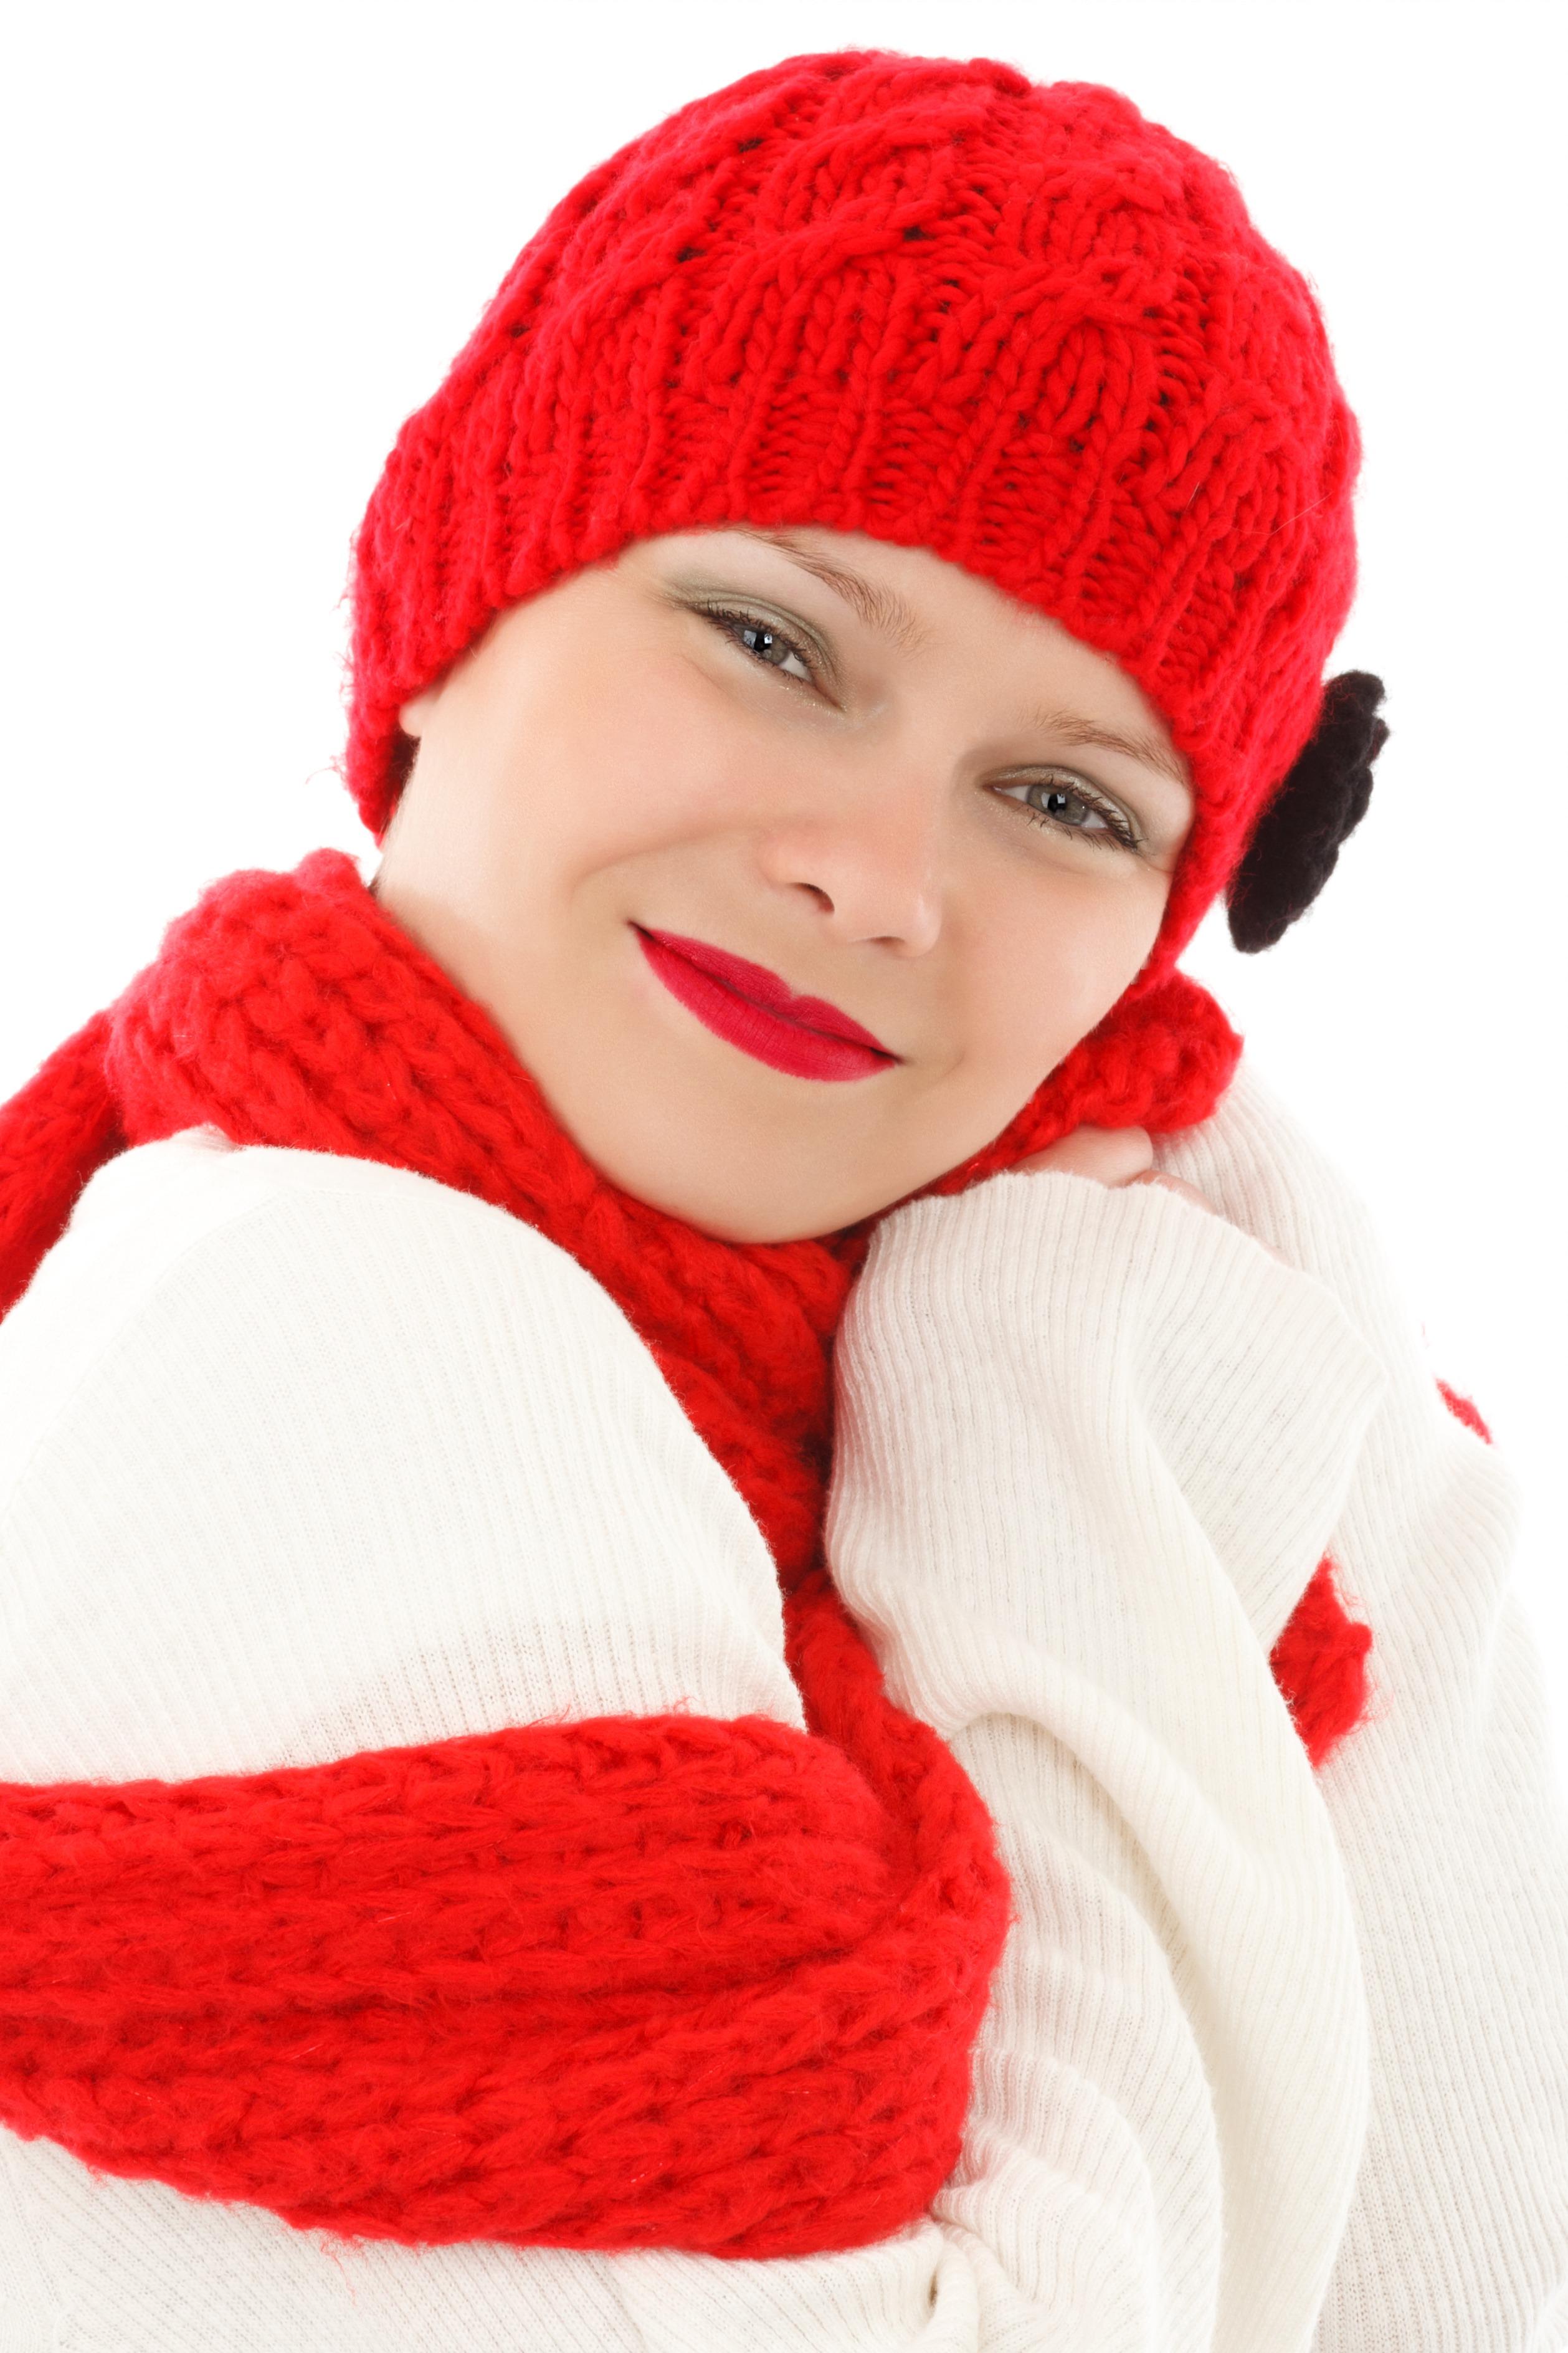 Fotos gratis : persona, niña, mujer, calentar, linda, hembra, patrón ...